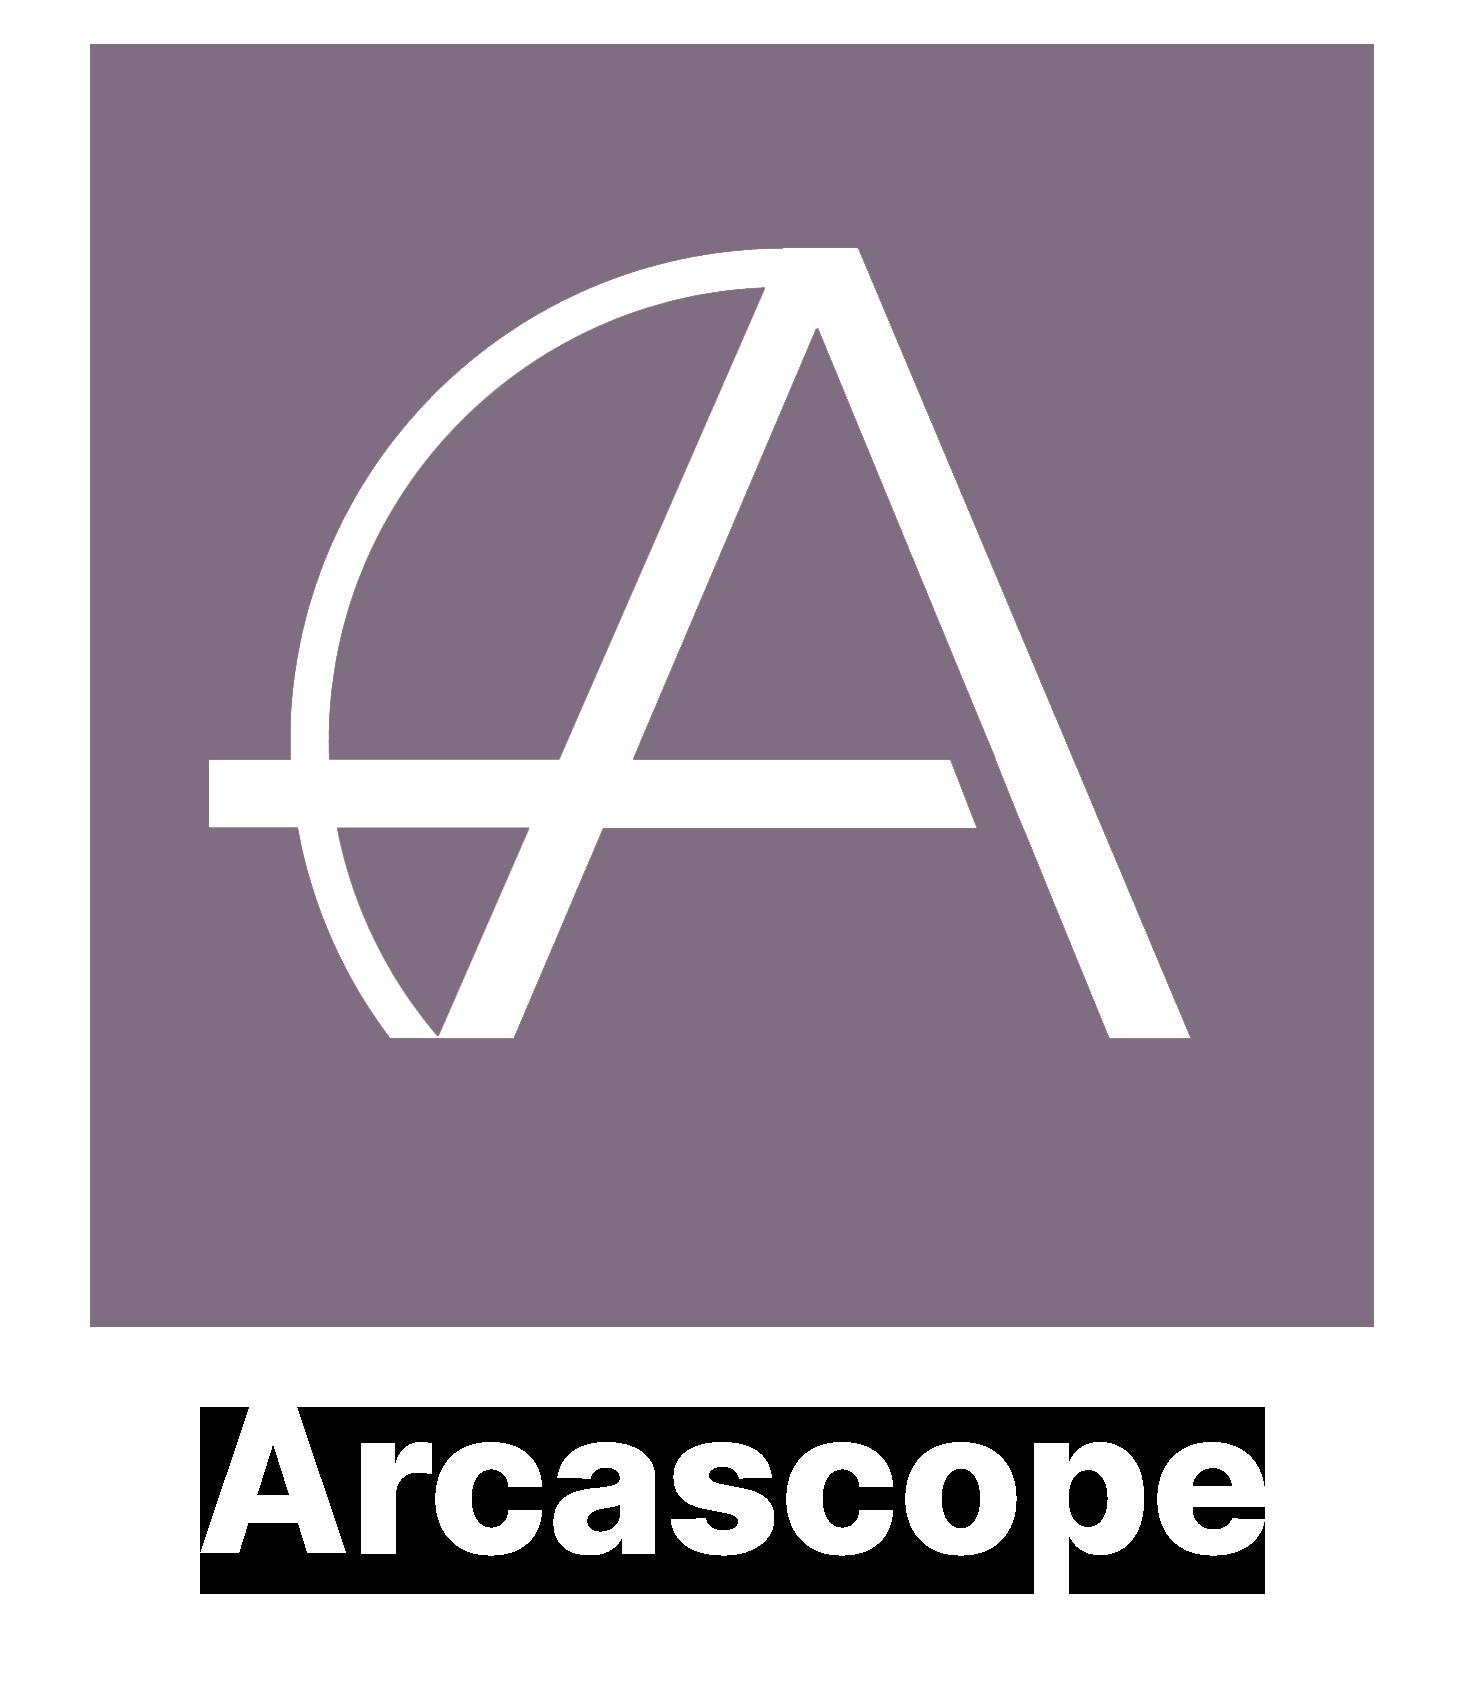 Arcascope